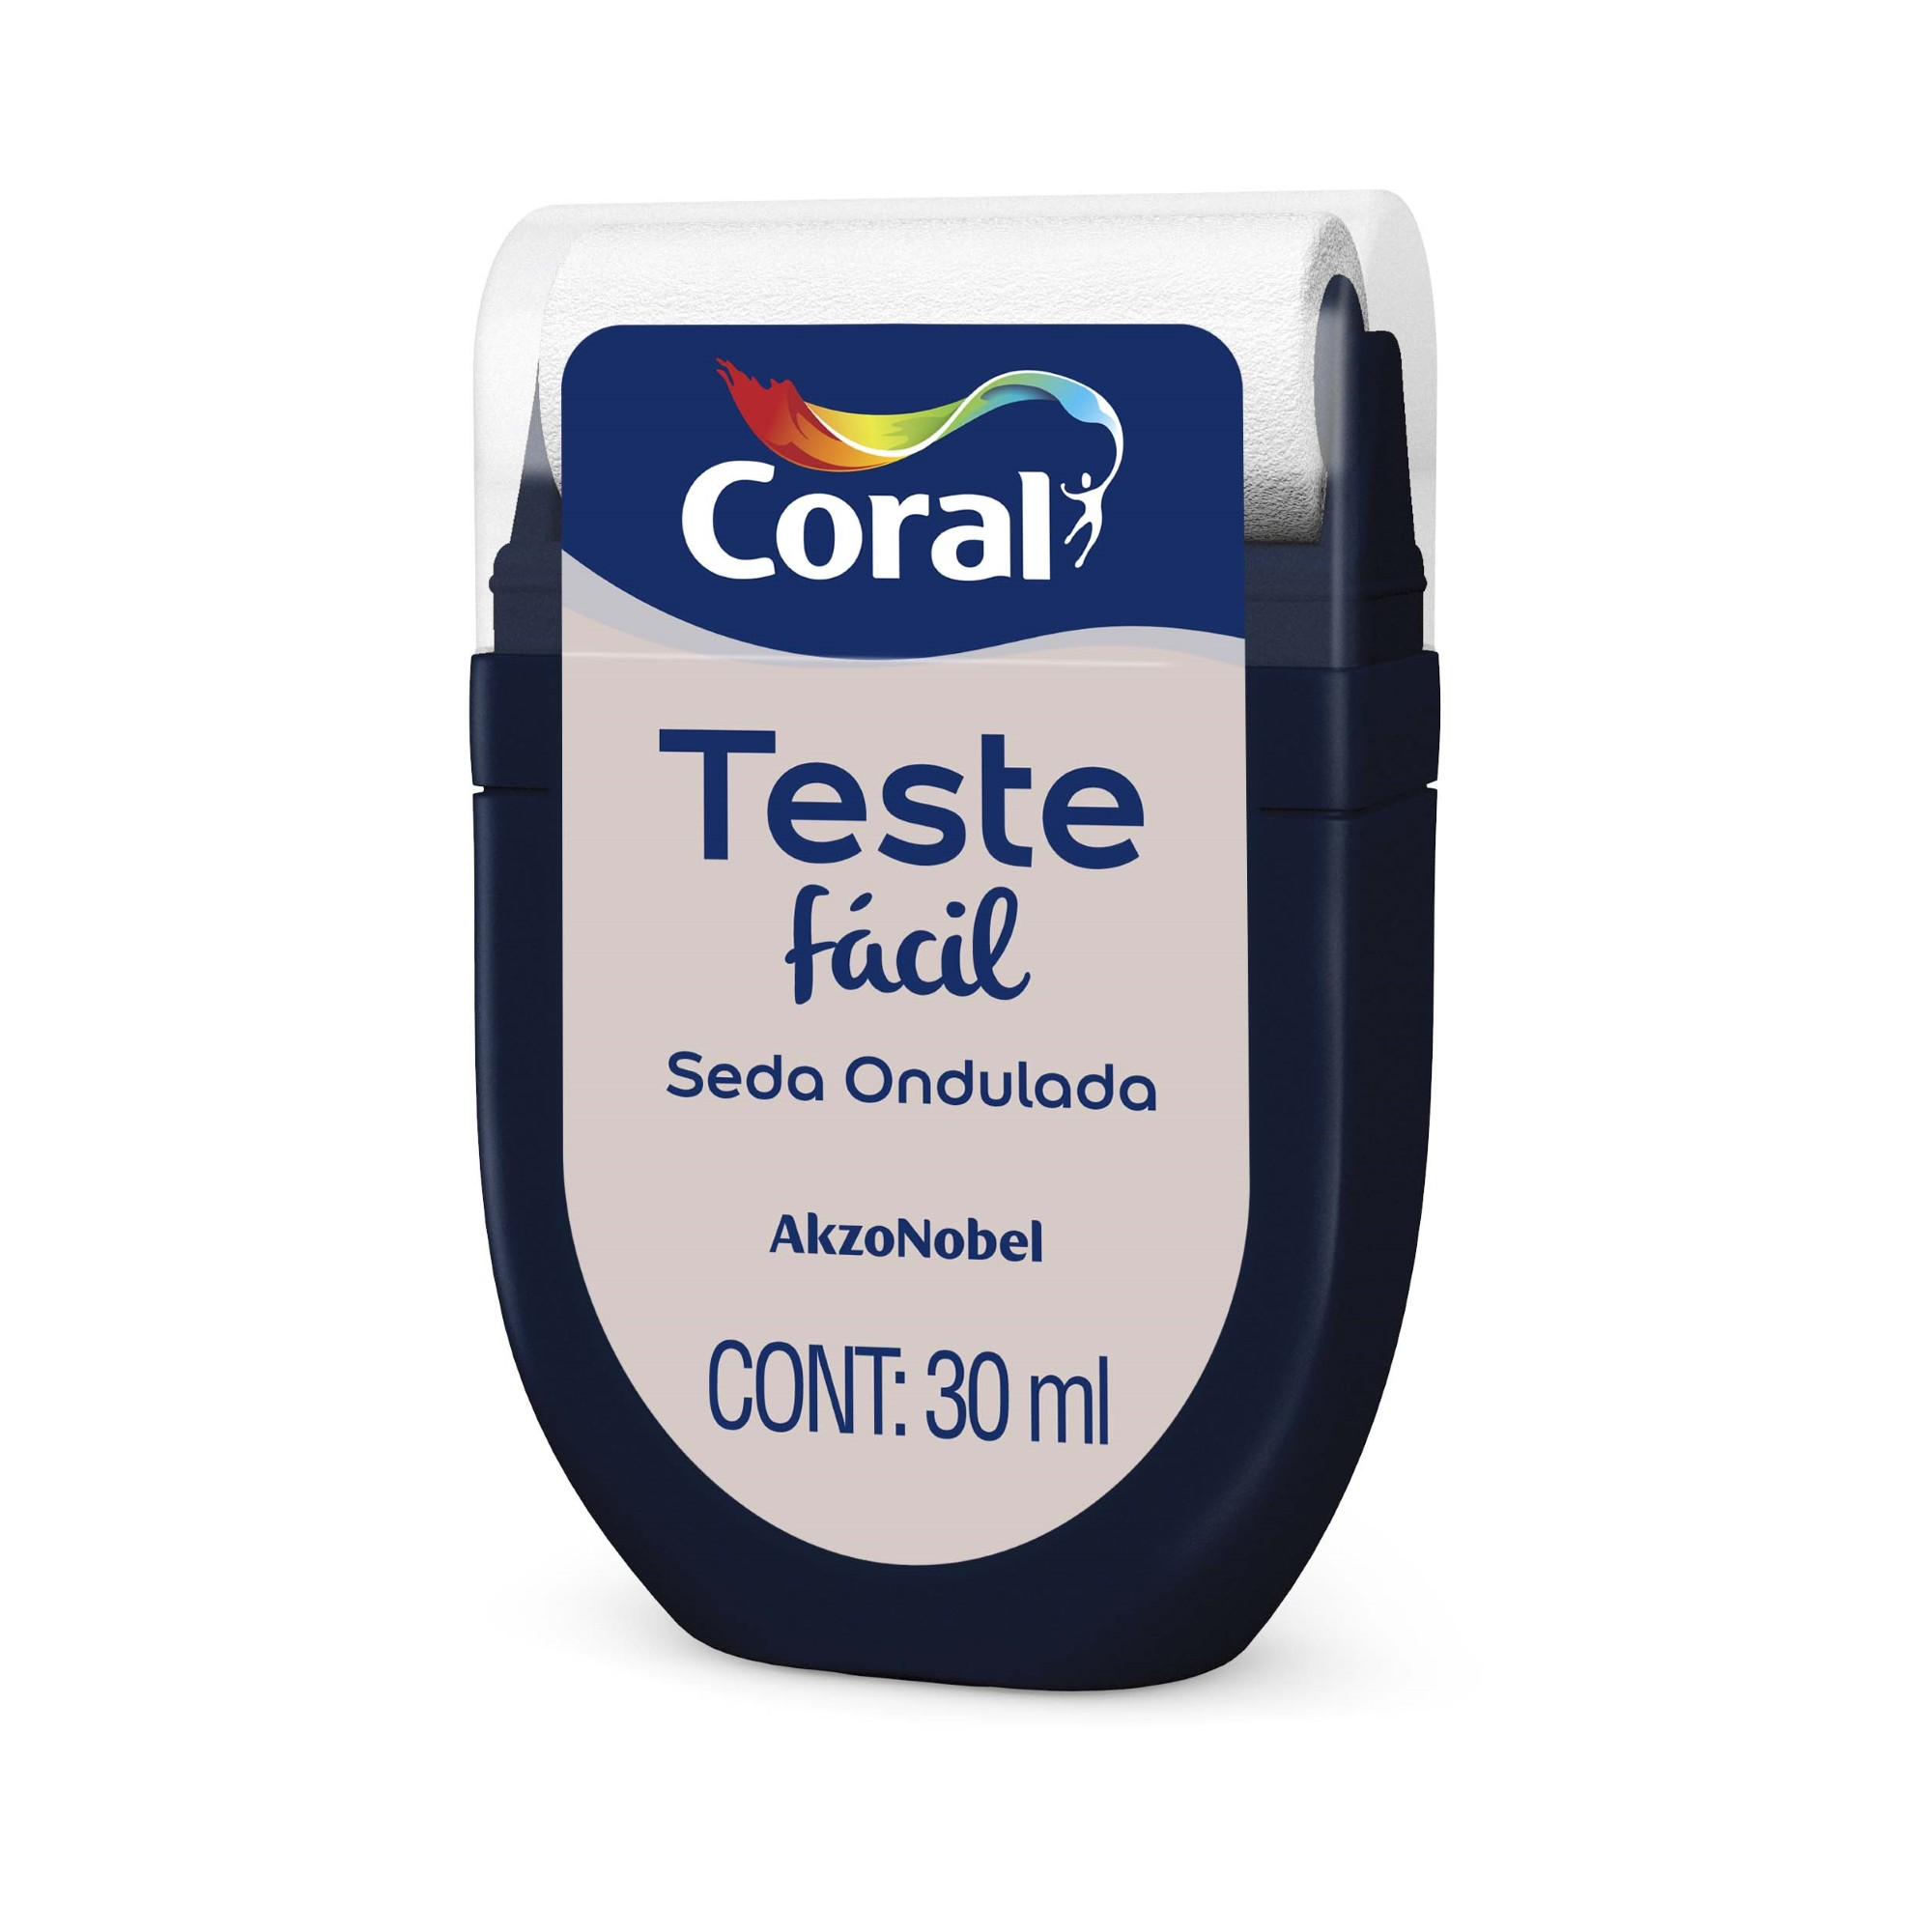 Teste Facil 30ml Seda Ondulada - Coral